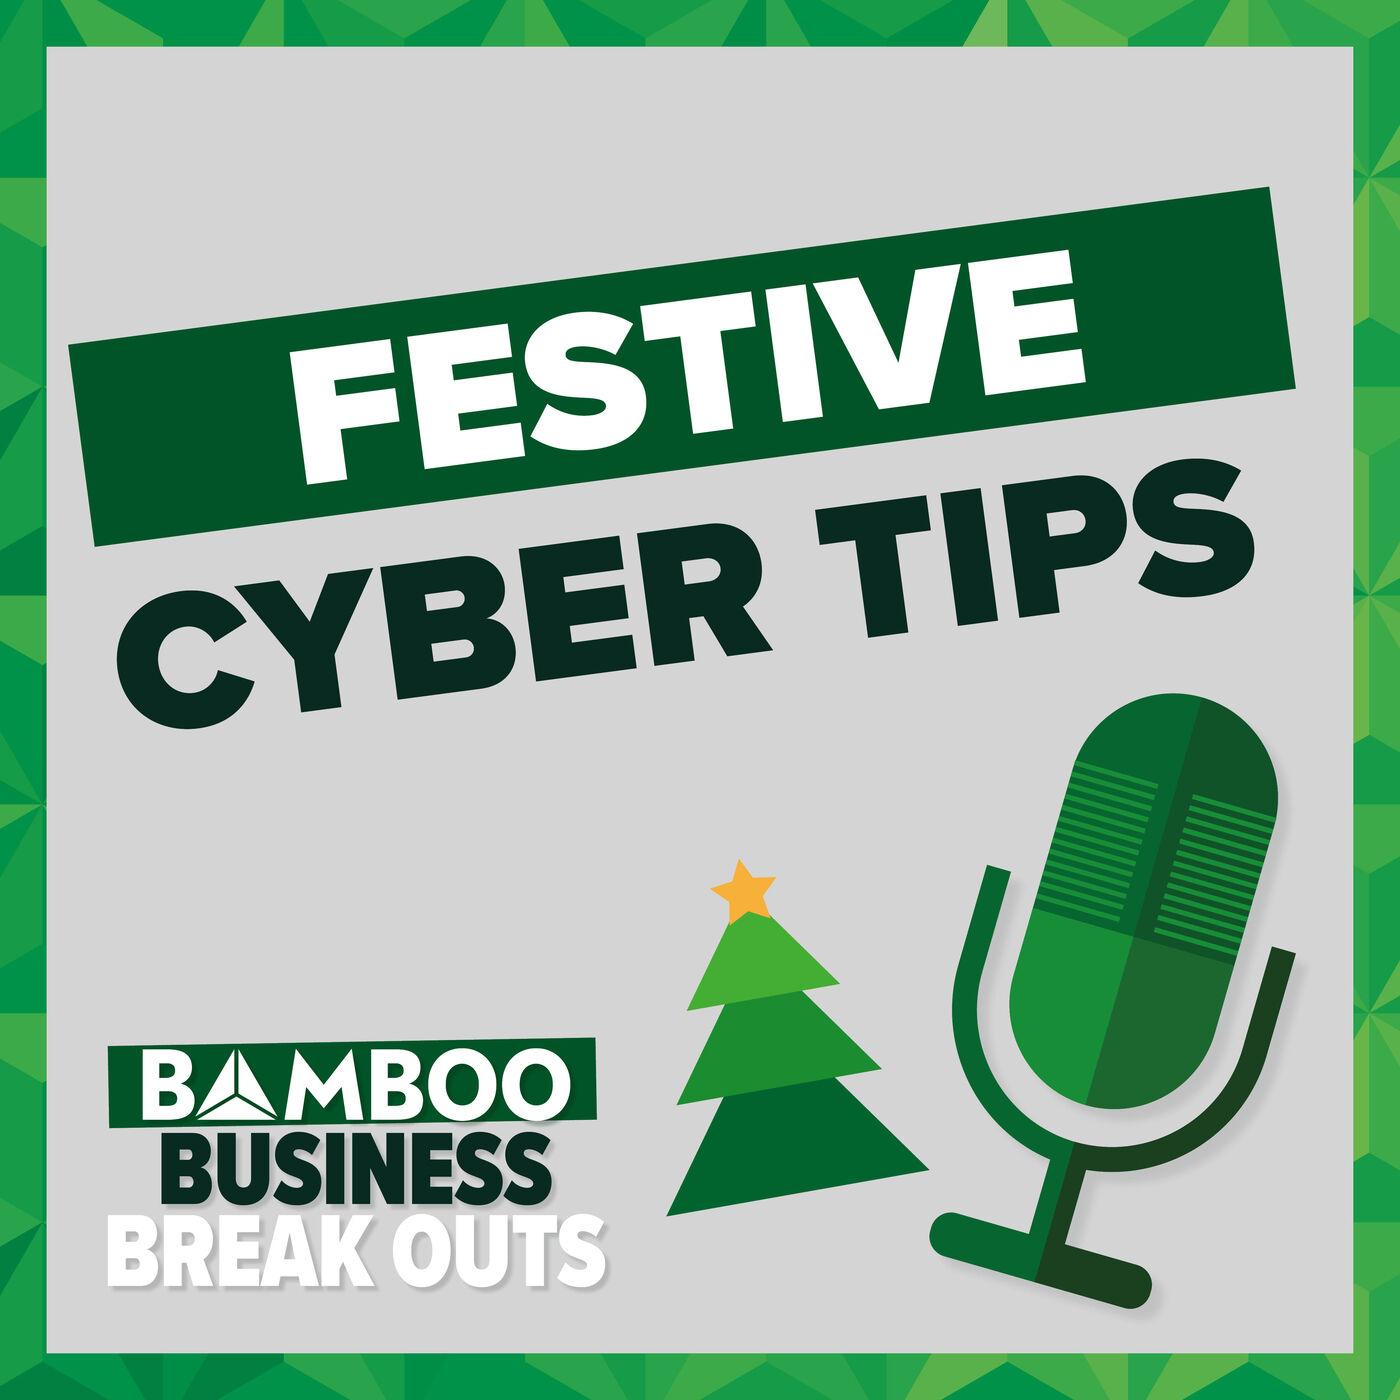 Festive Cyber Tips